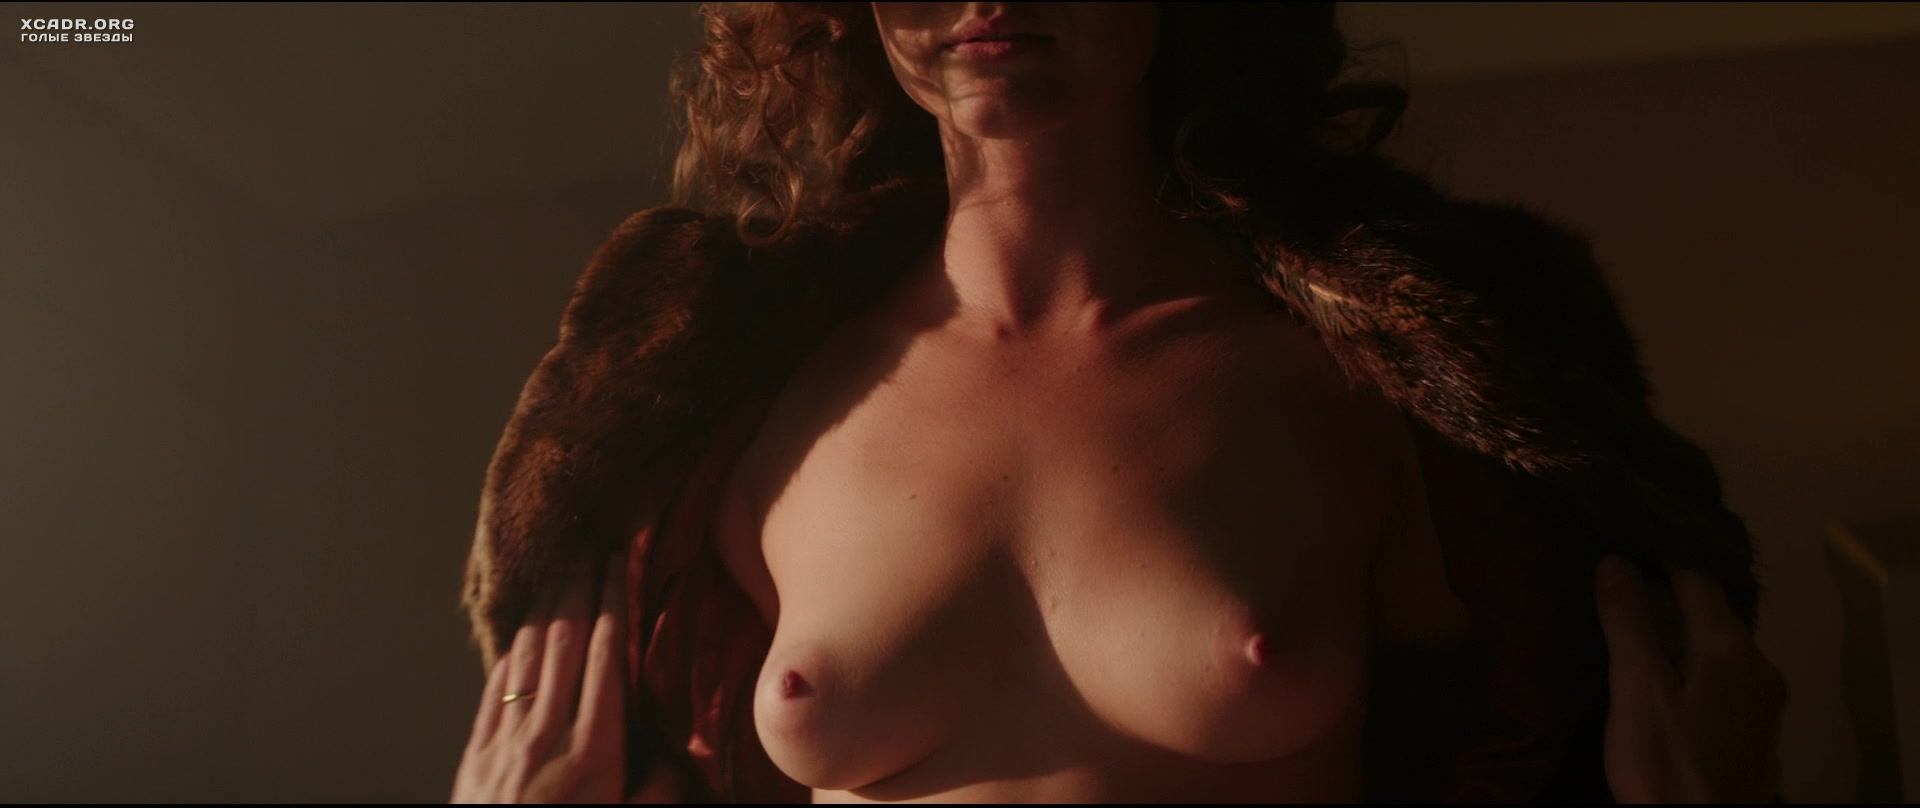 Lauren London Nude Pics Pics, Sex Tape Ancensored